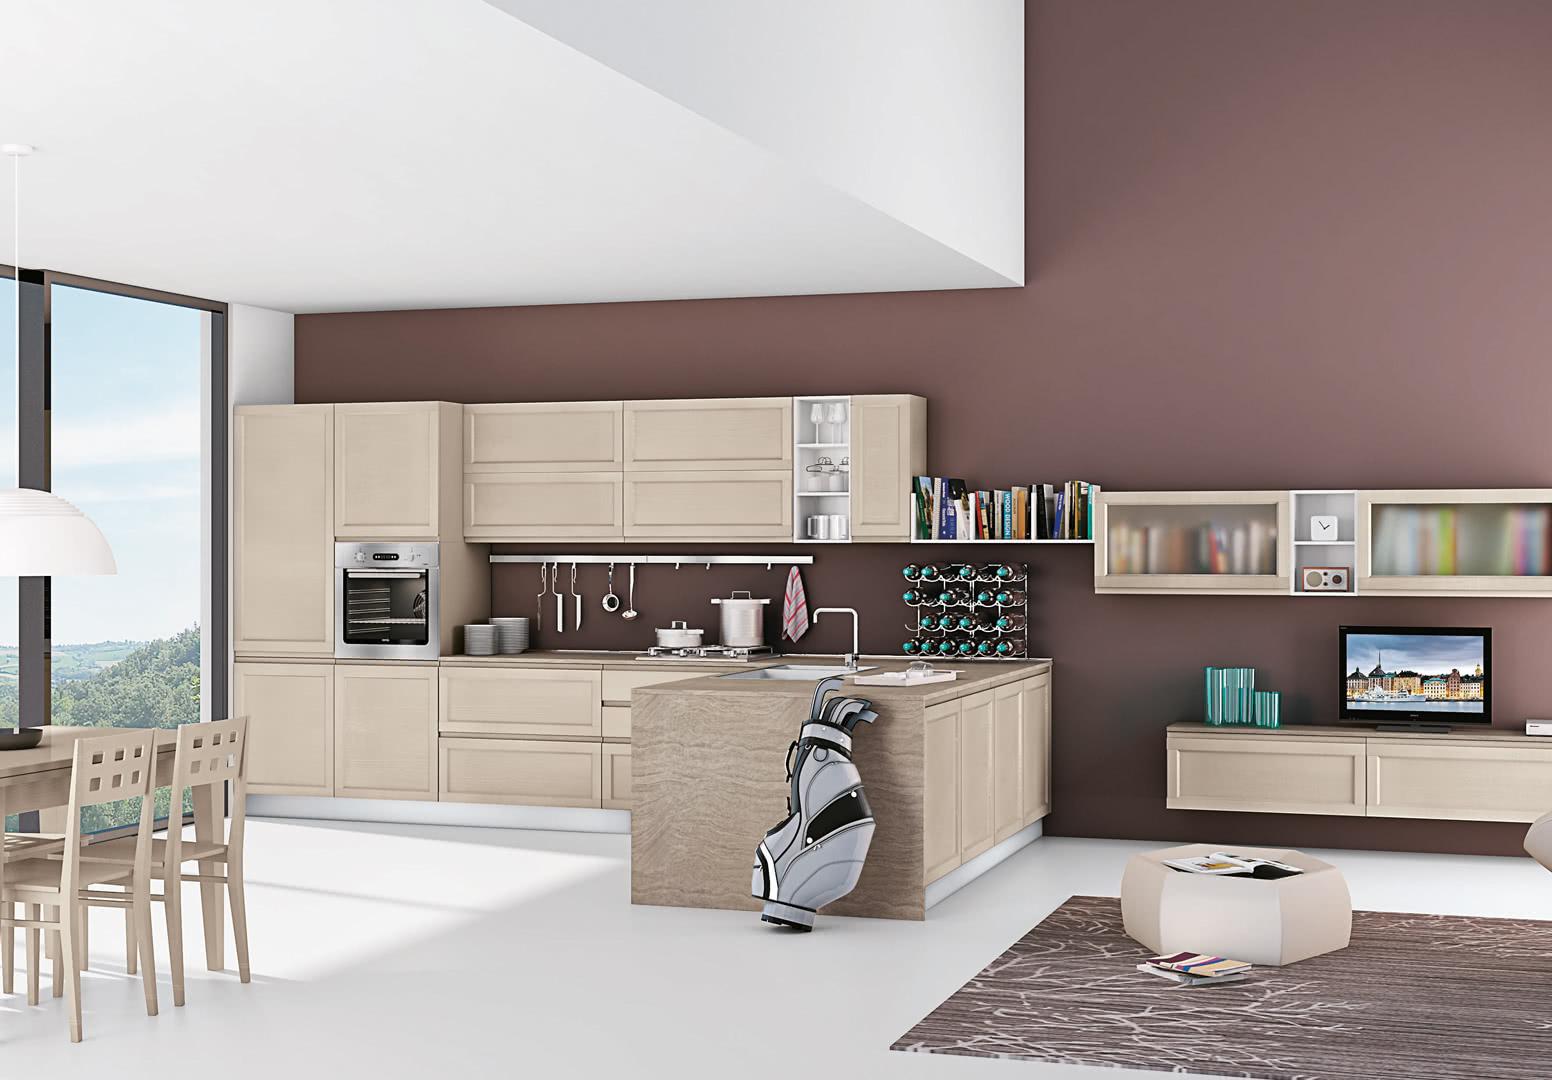 1123_selma-cucina-ambientata-5